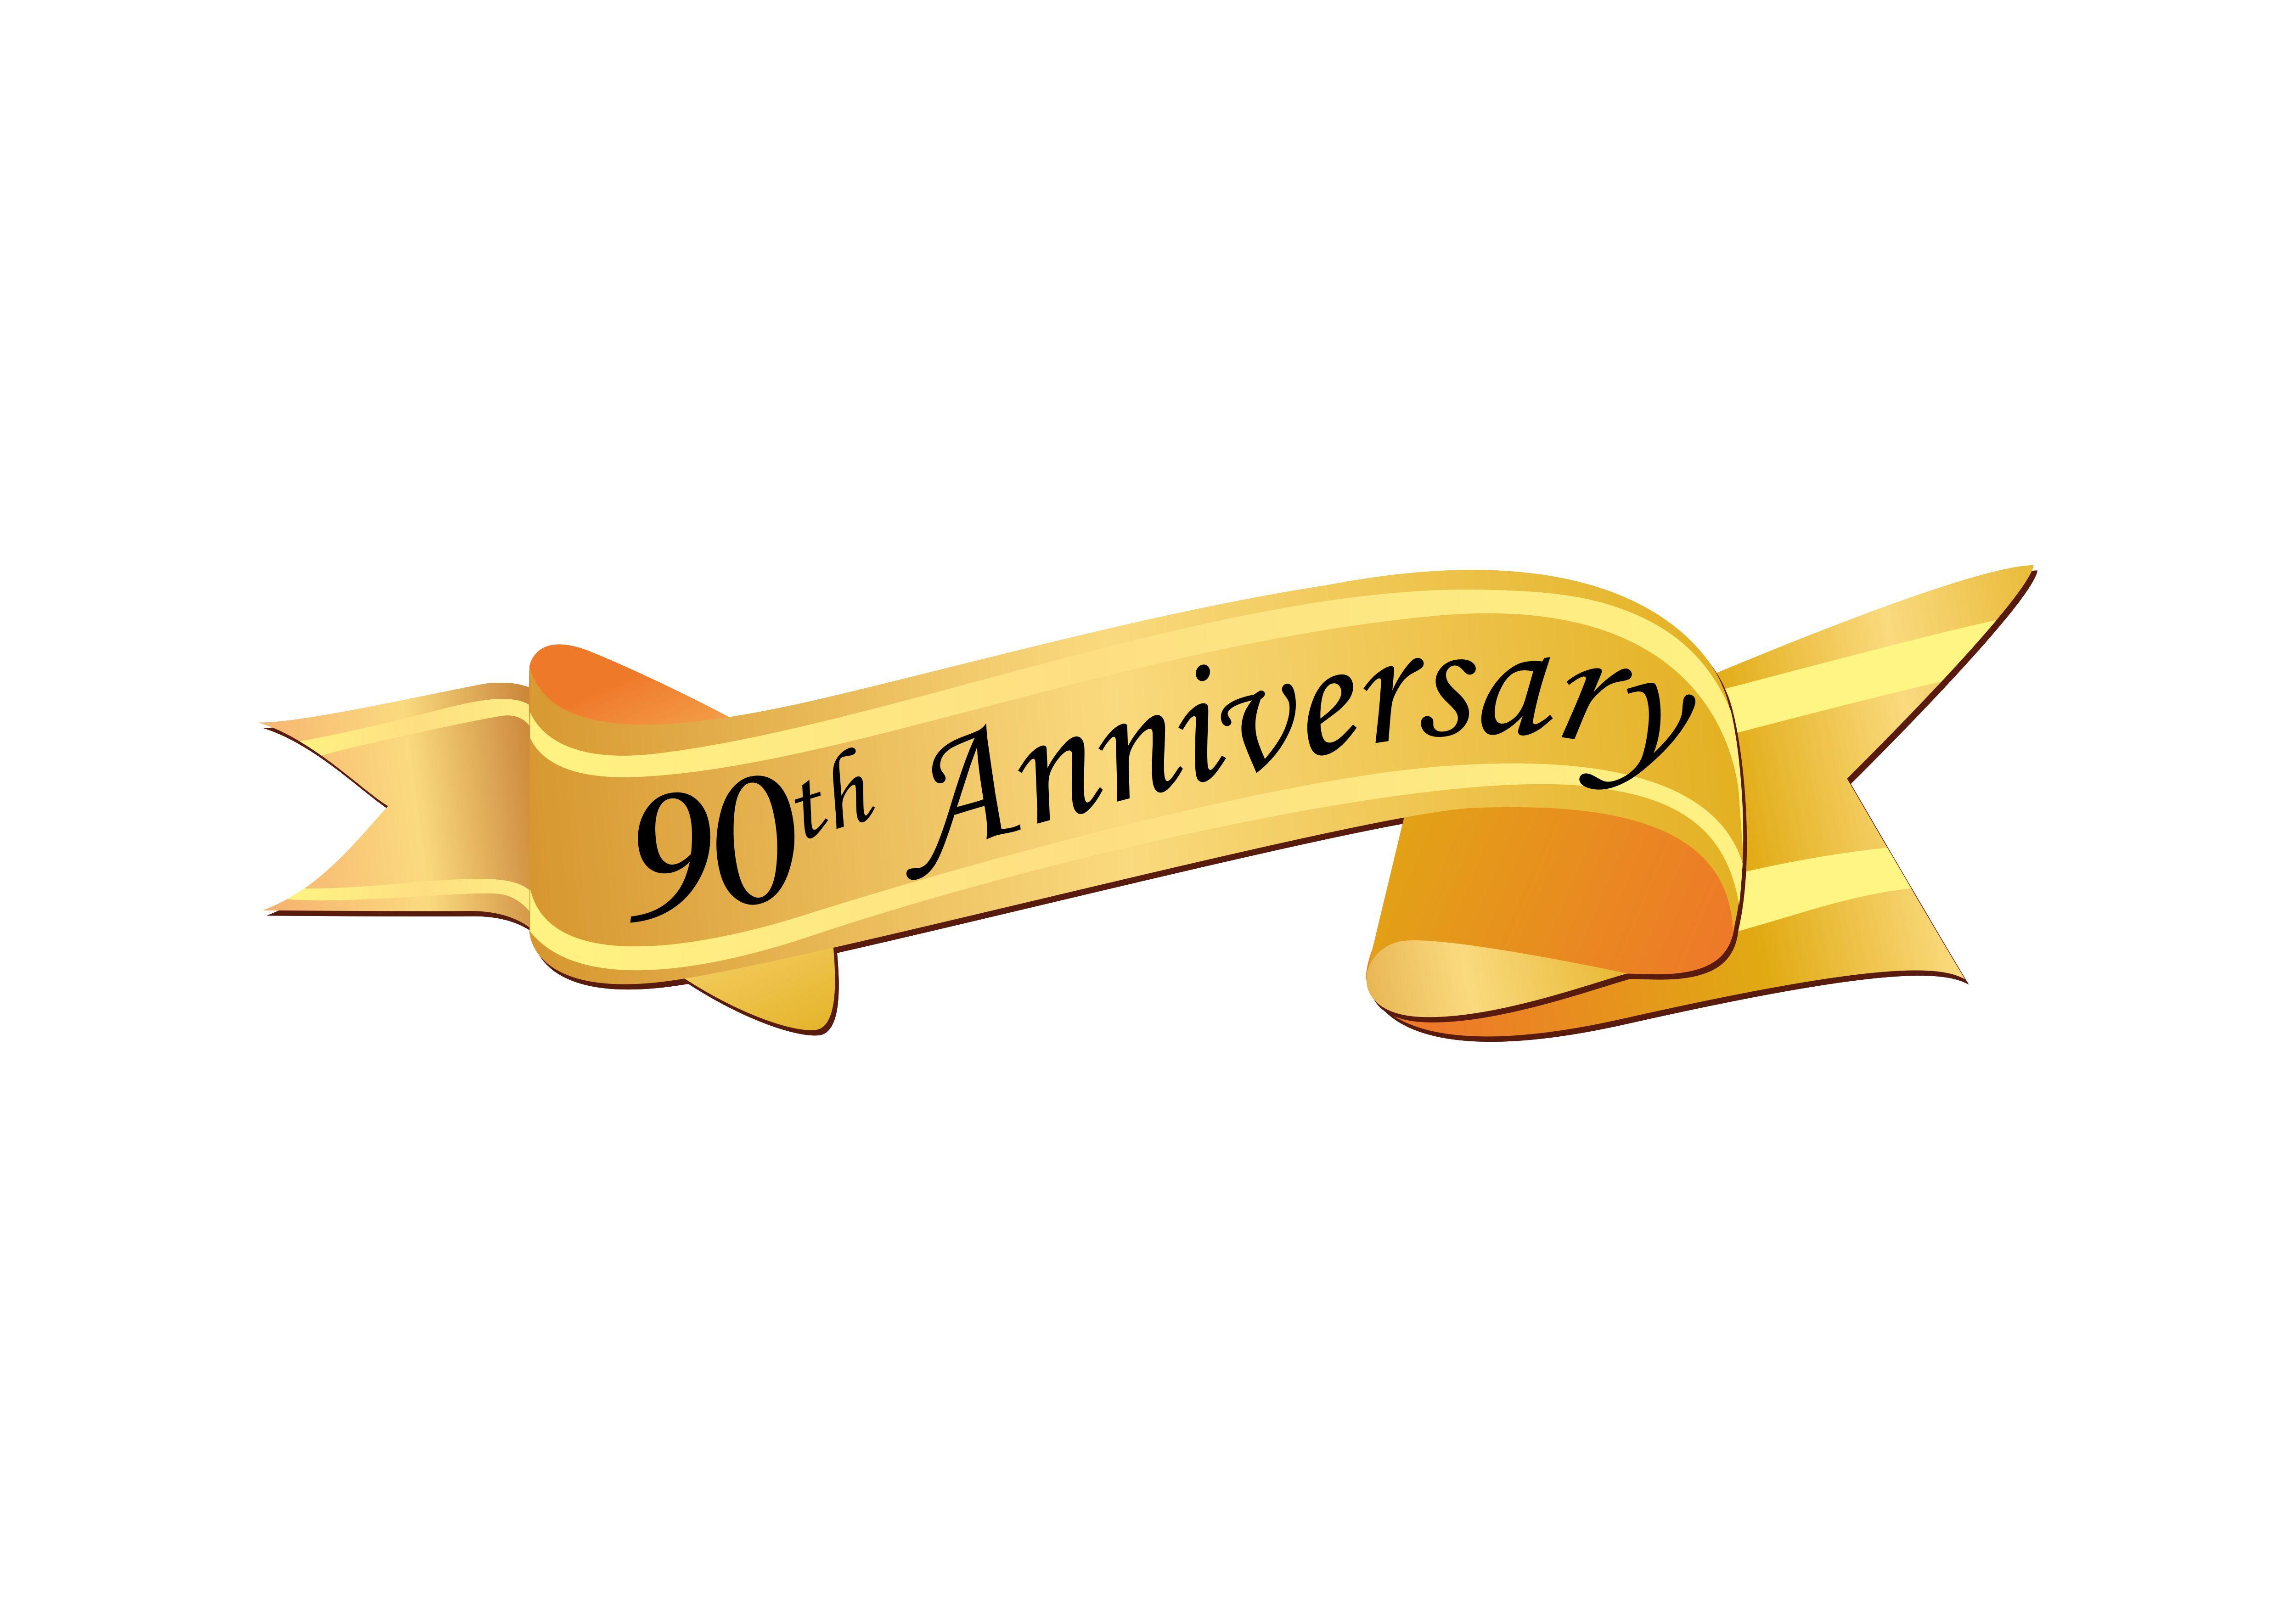 90th Anniversary luxury logo.